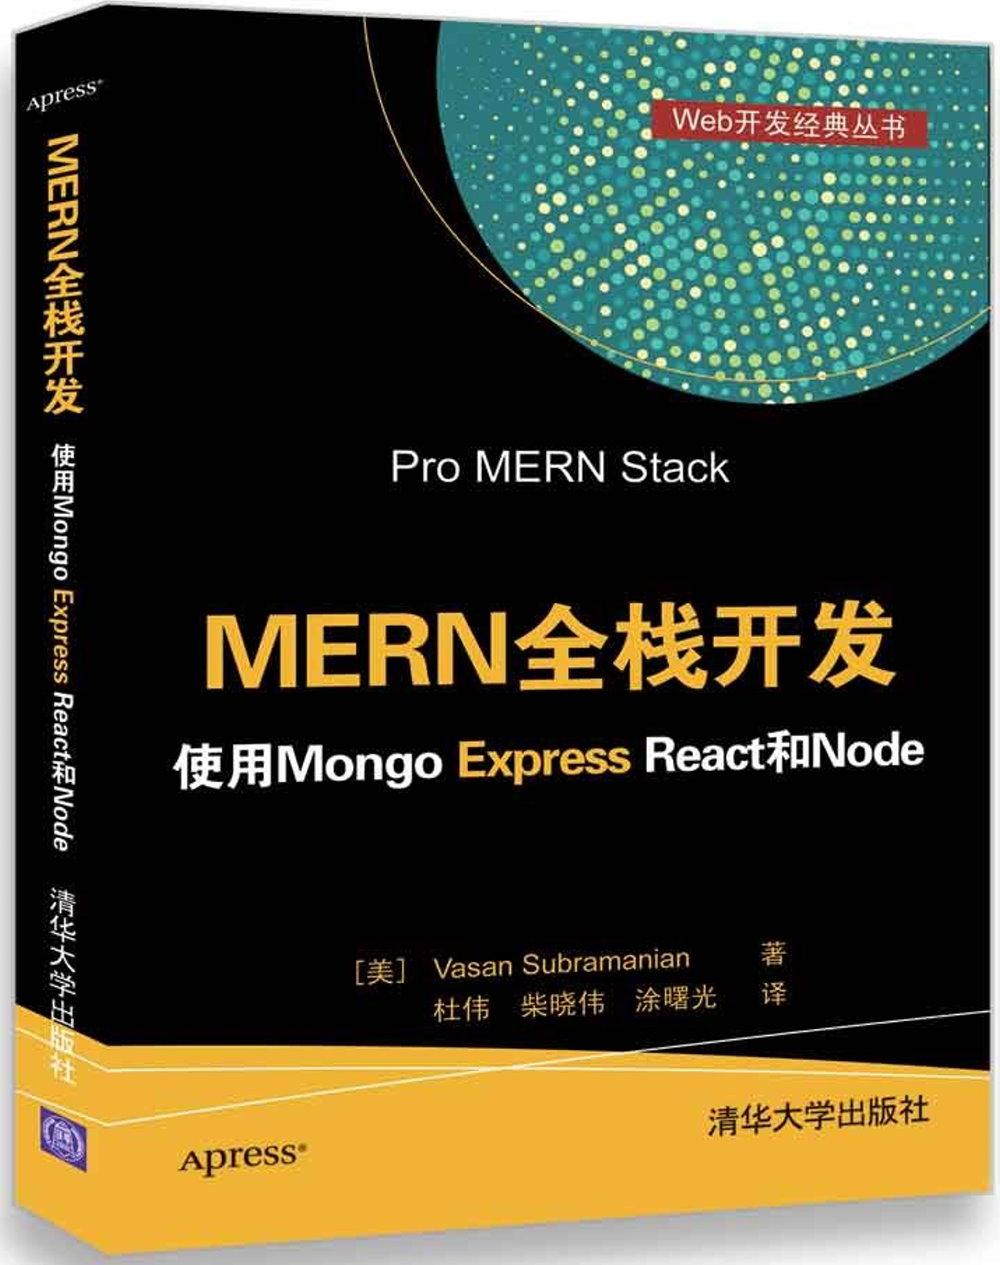 MERN全棧開發:使用Mongo Express React和Node